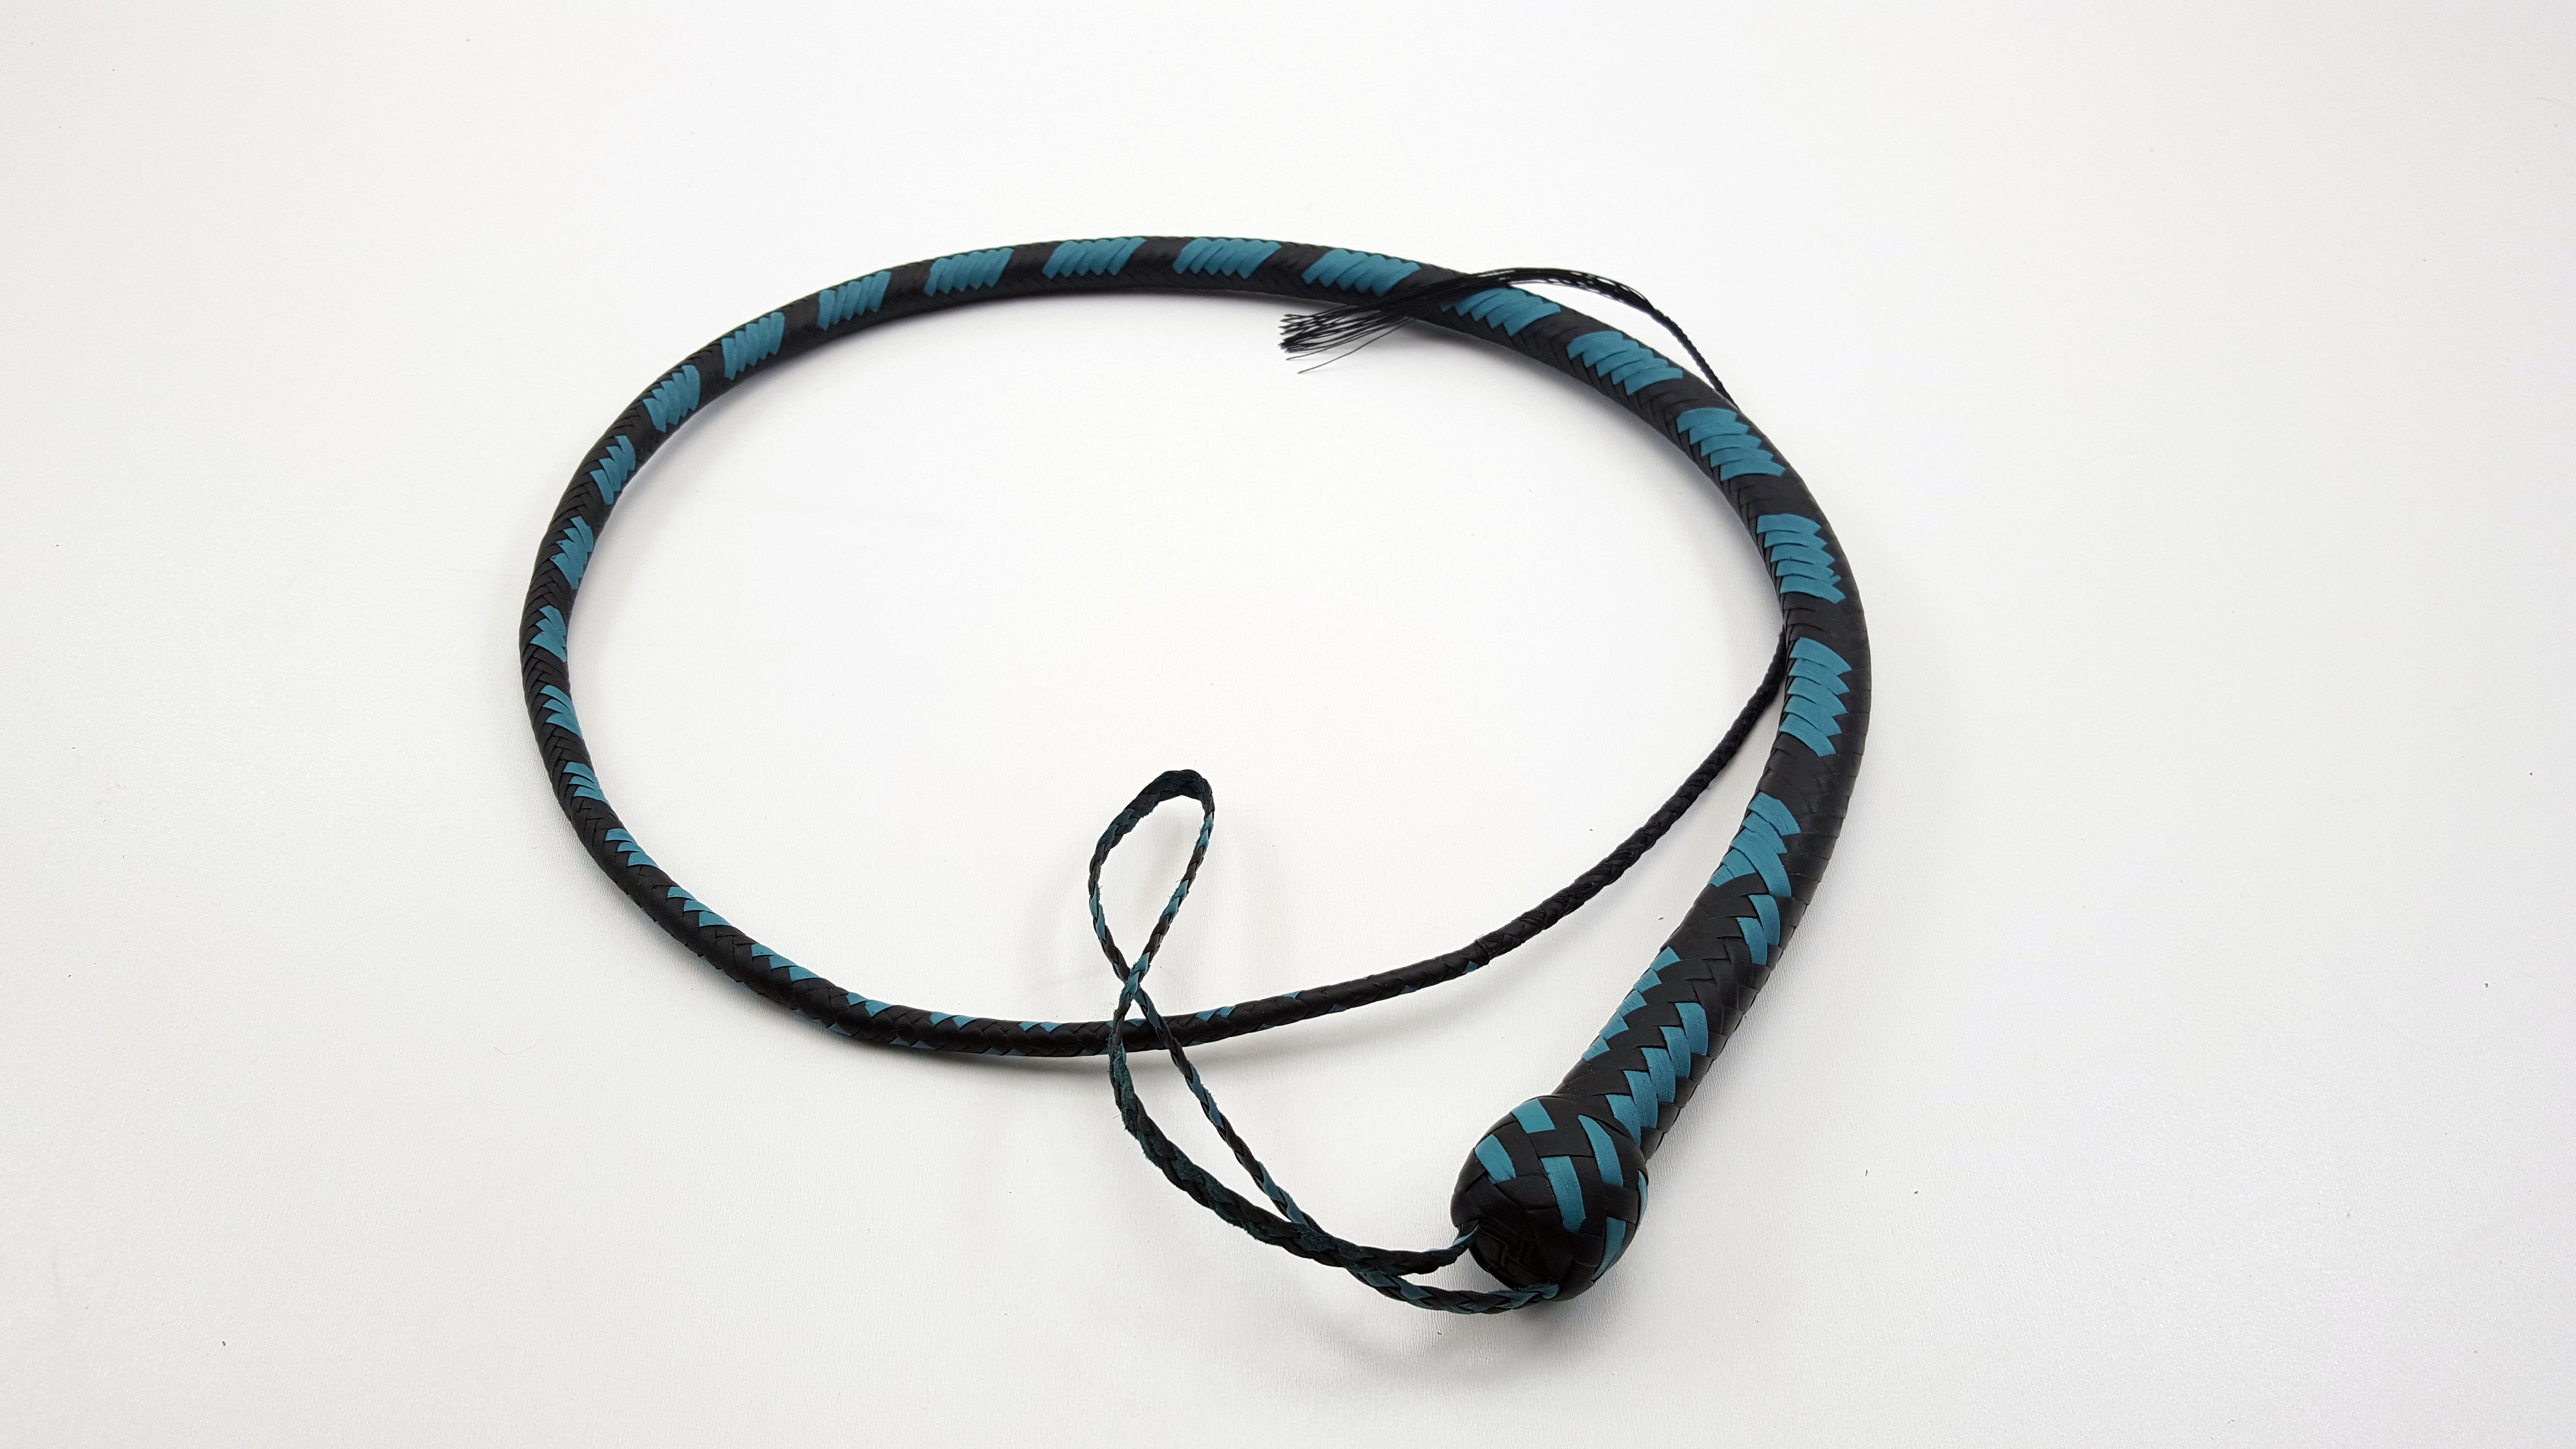 Black & Turq 16 Plait Signal Whip